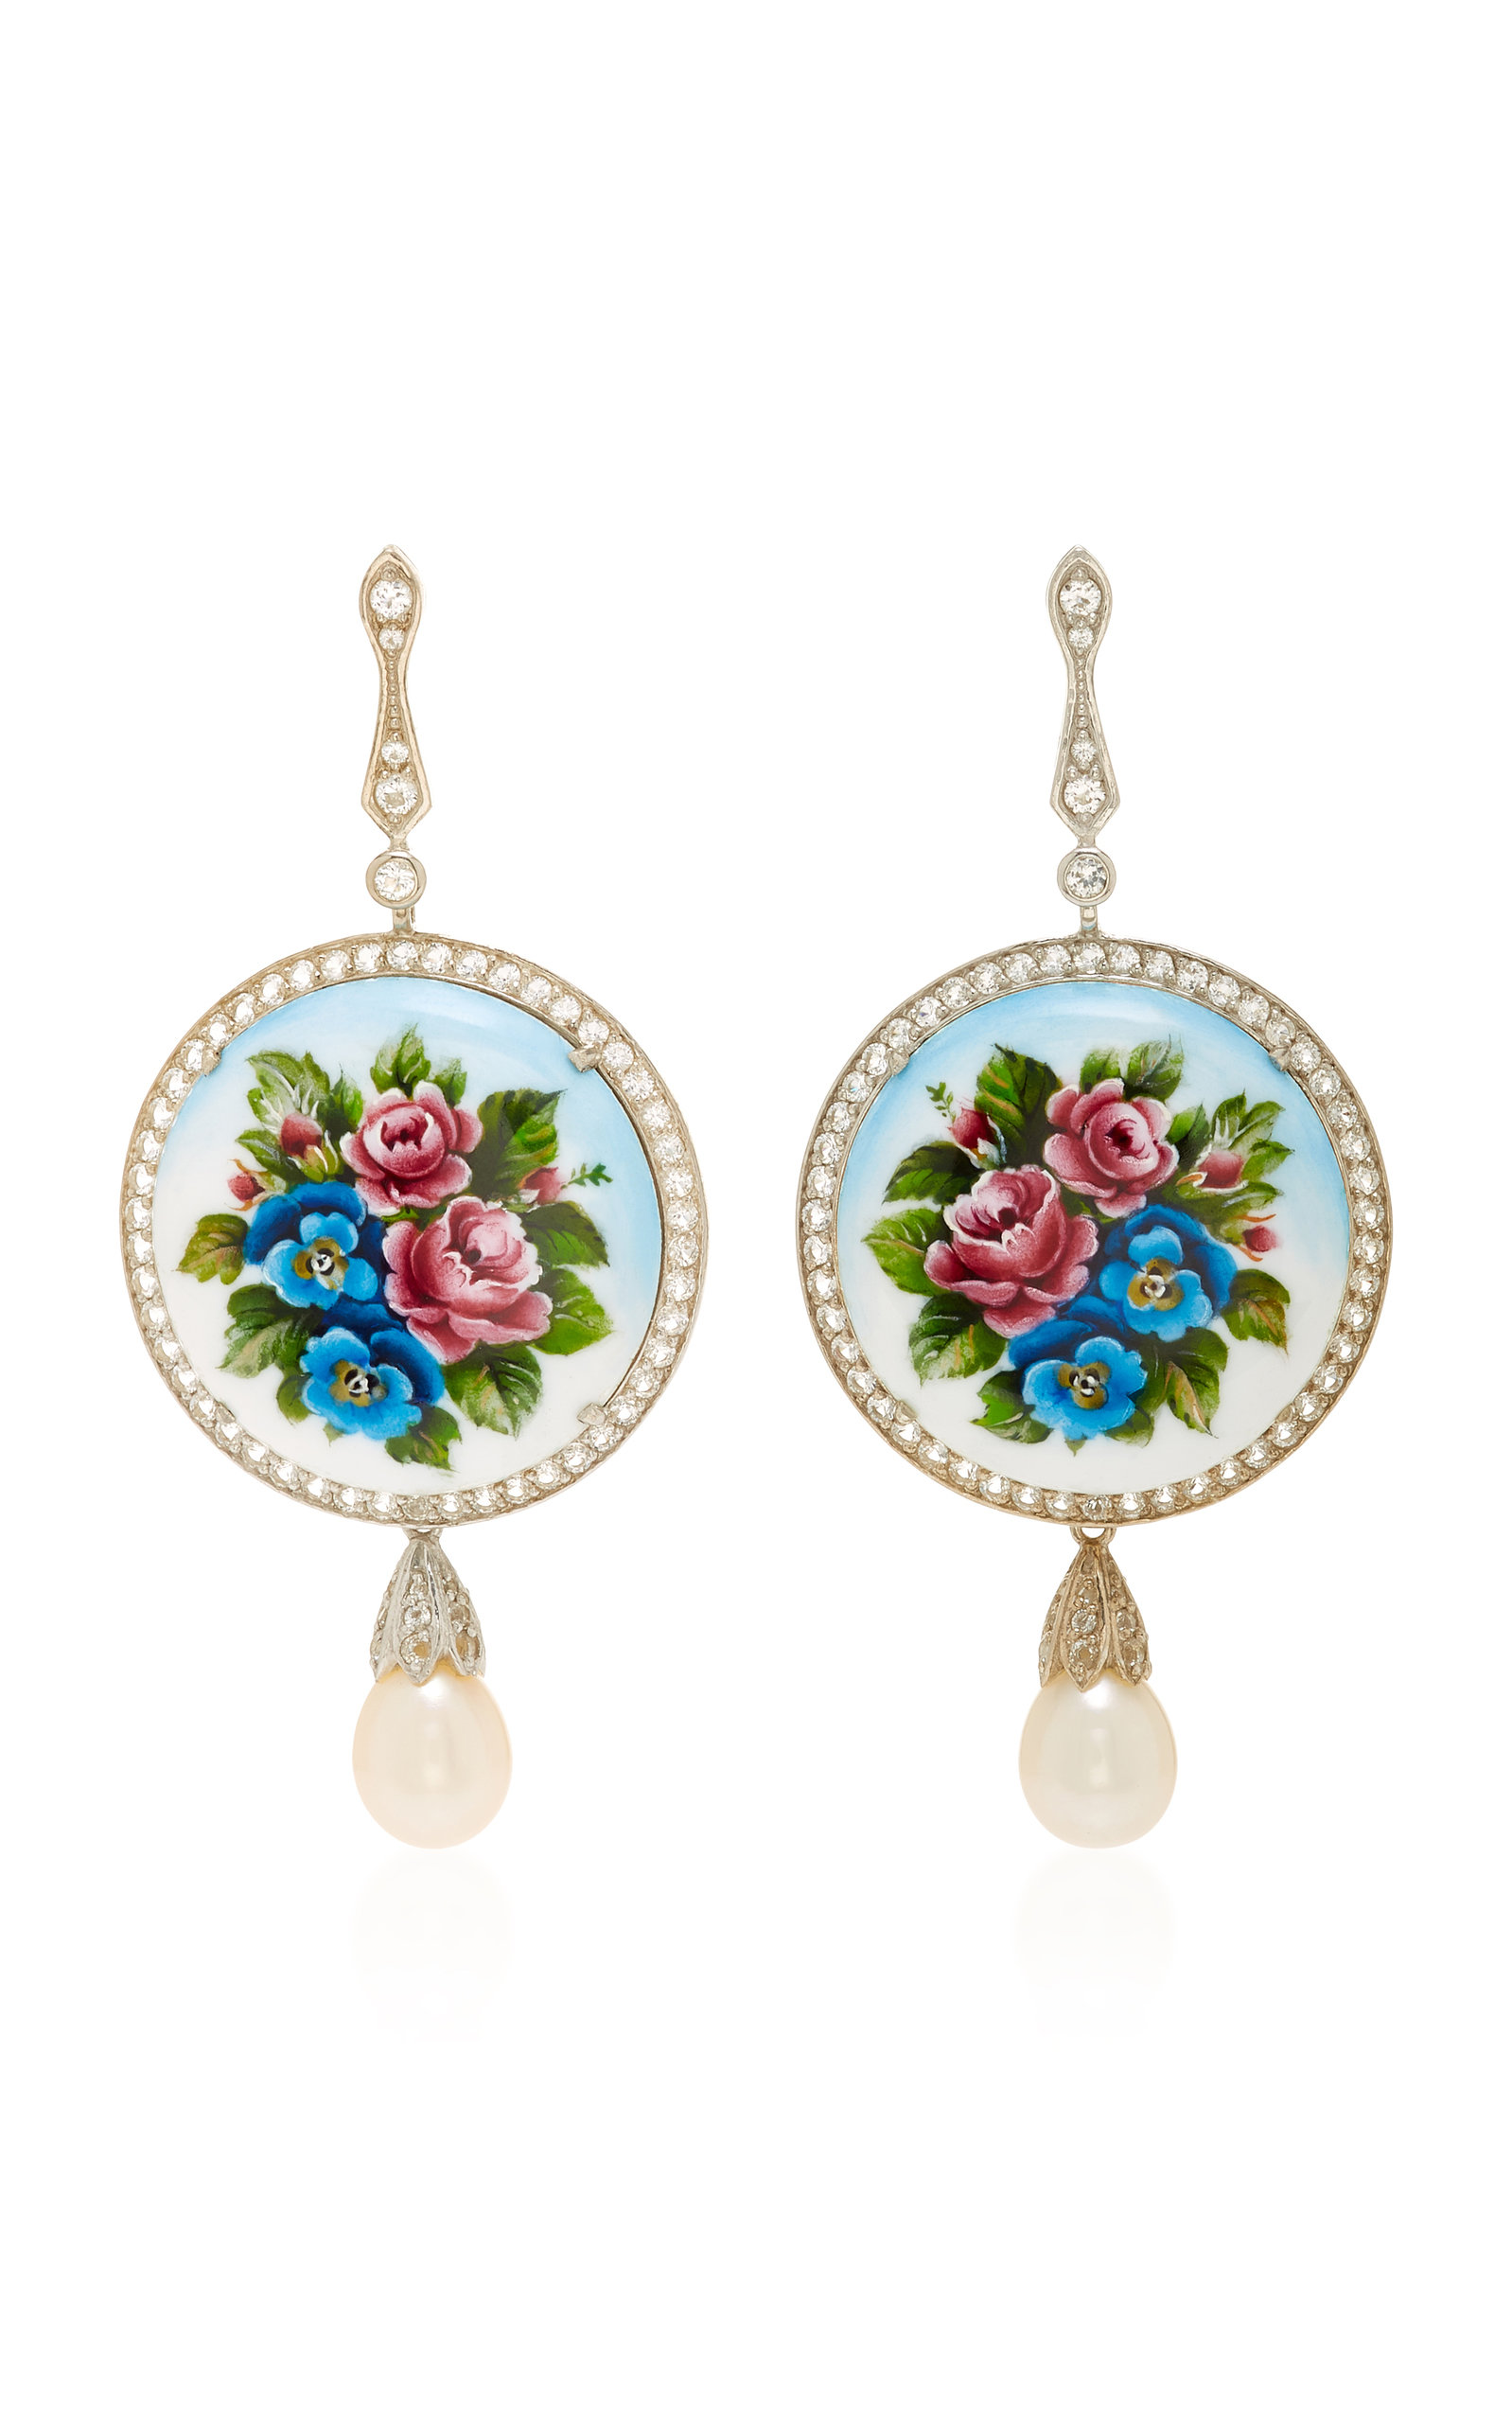 AXENOFF JEWELLERY Magic Flowers Silver Drop Earrings in Floral